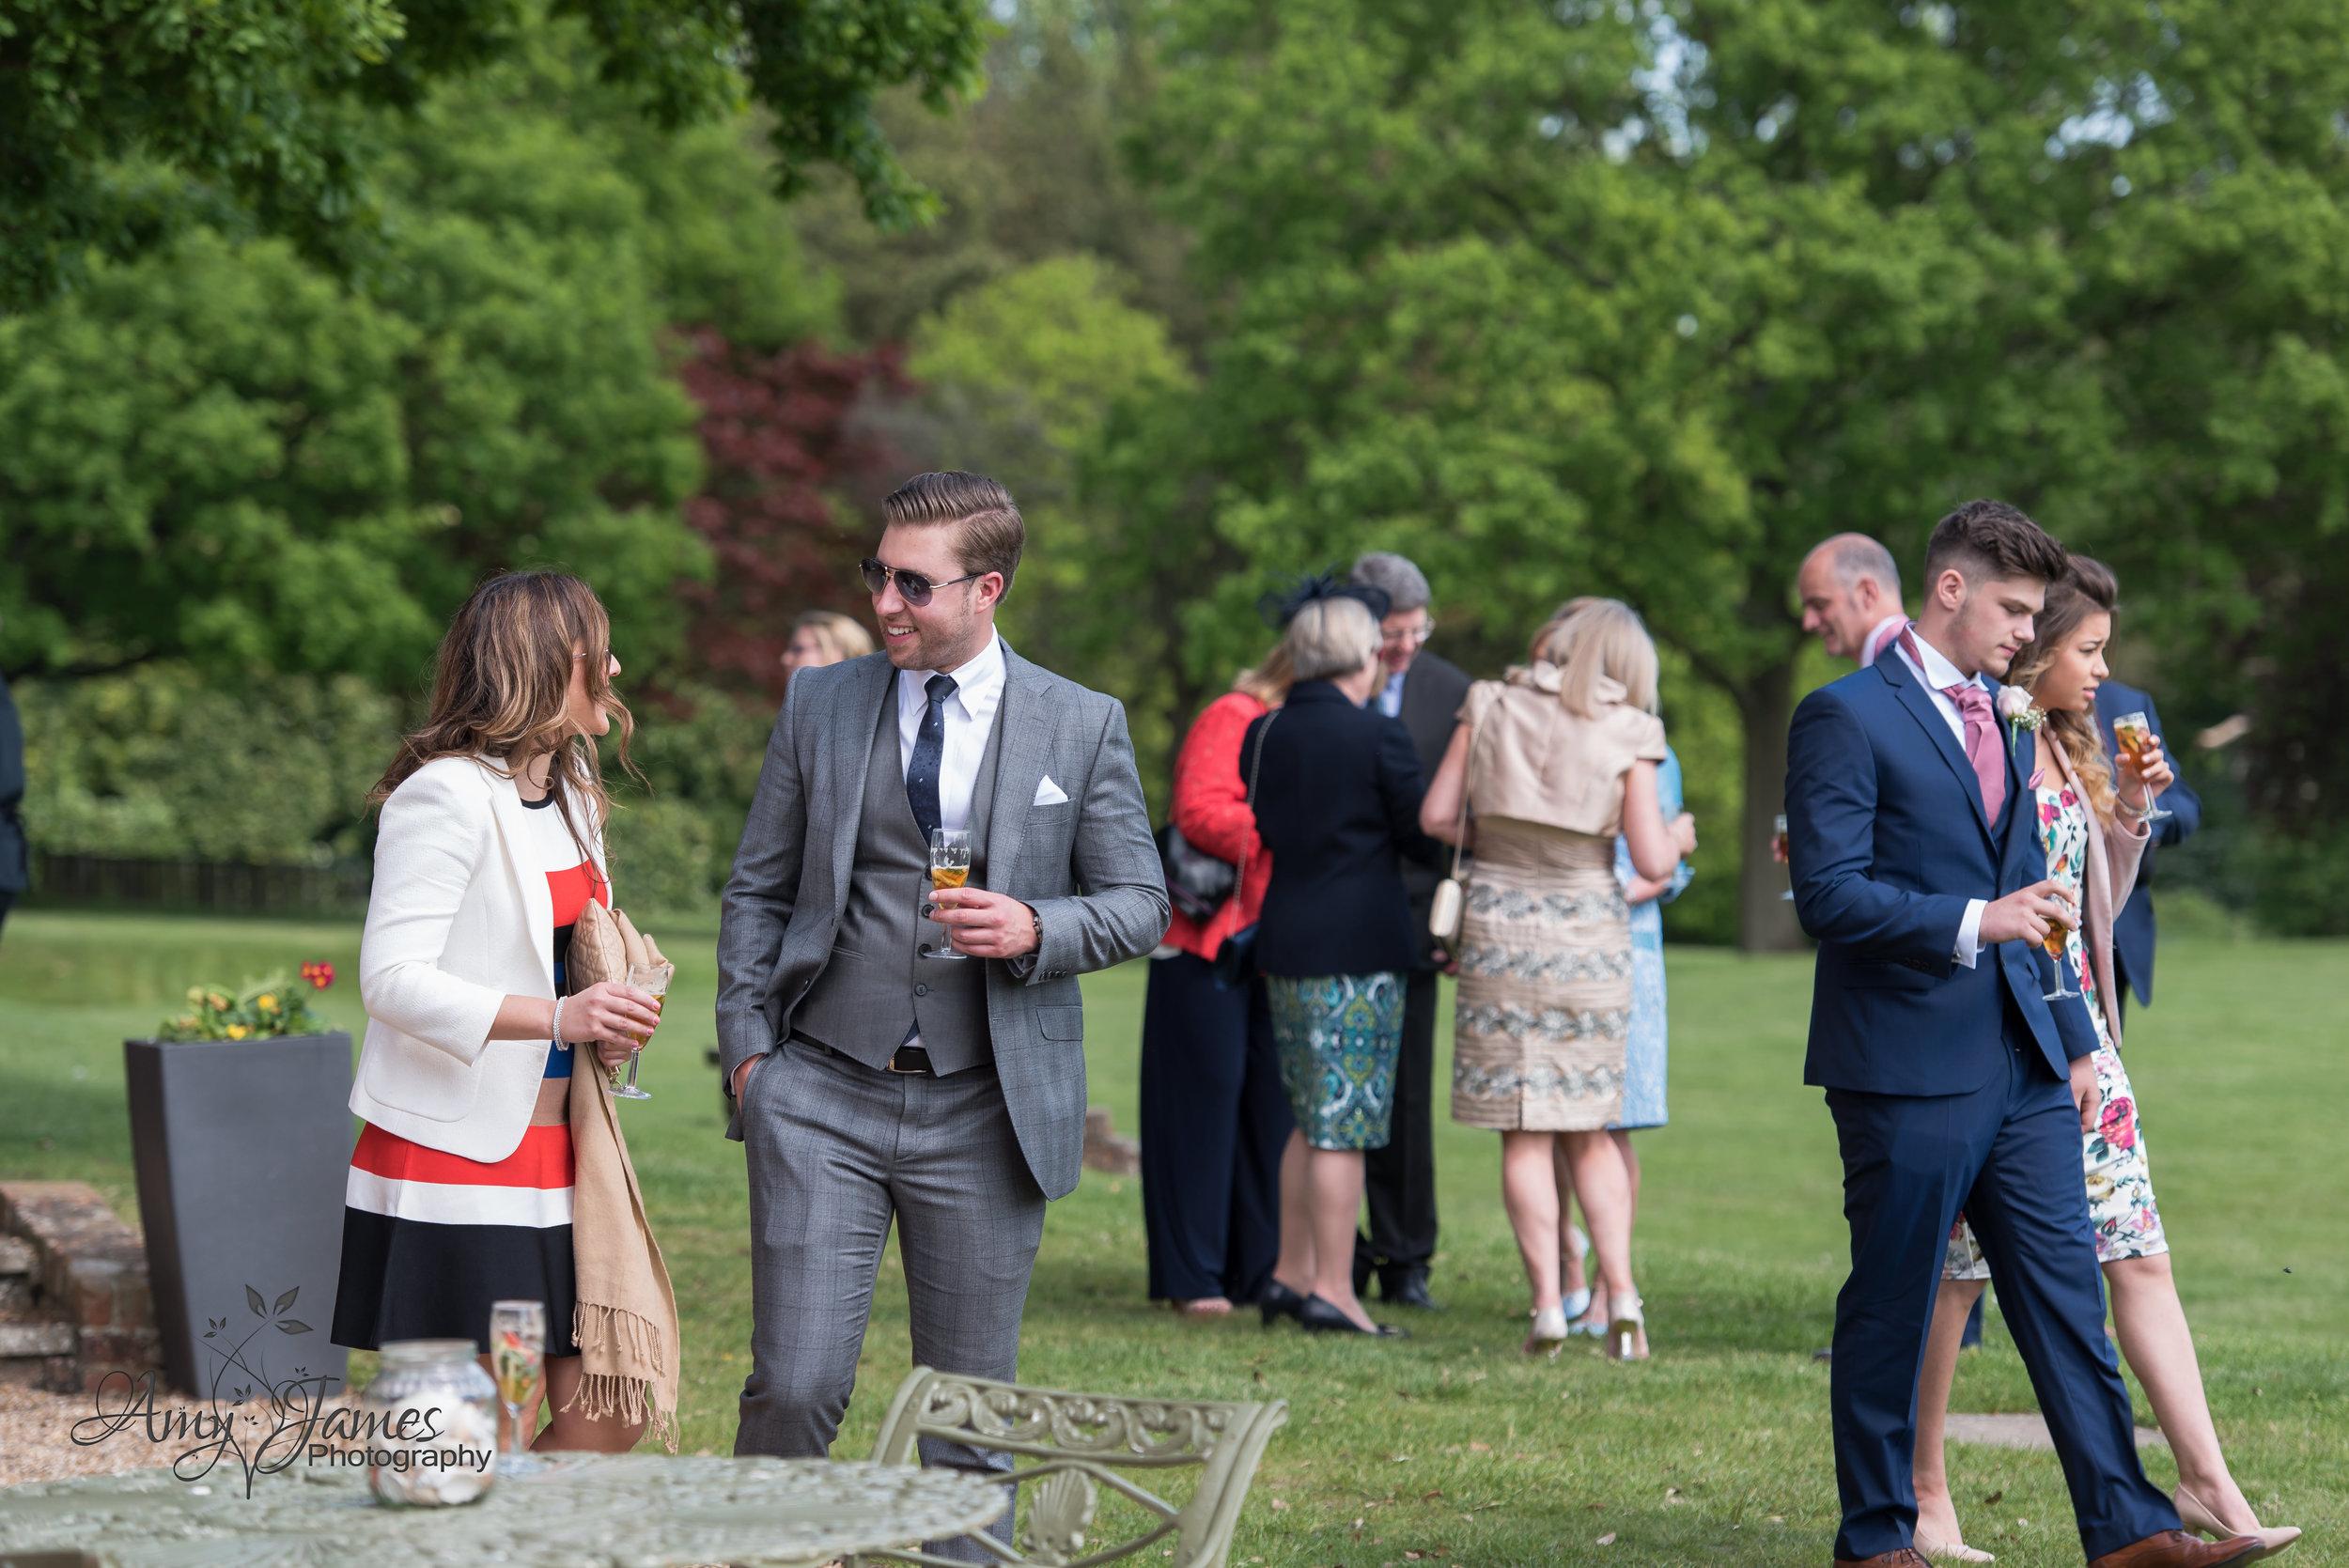 Highfield Park Hampshire Wedding Photographer | Highfield Park Wedding Venue | Amy James Photography